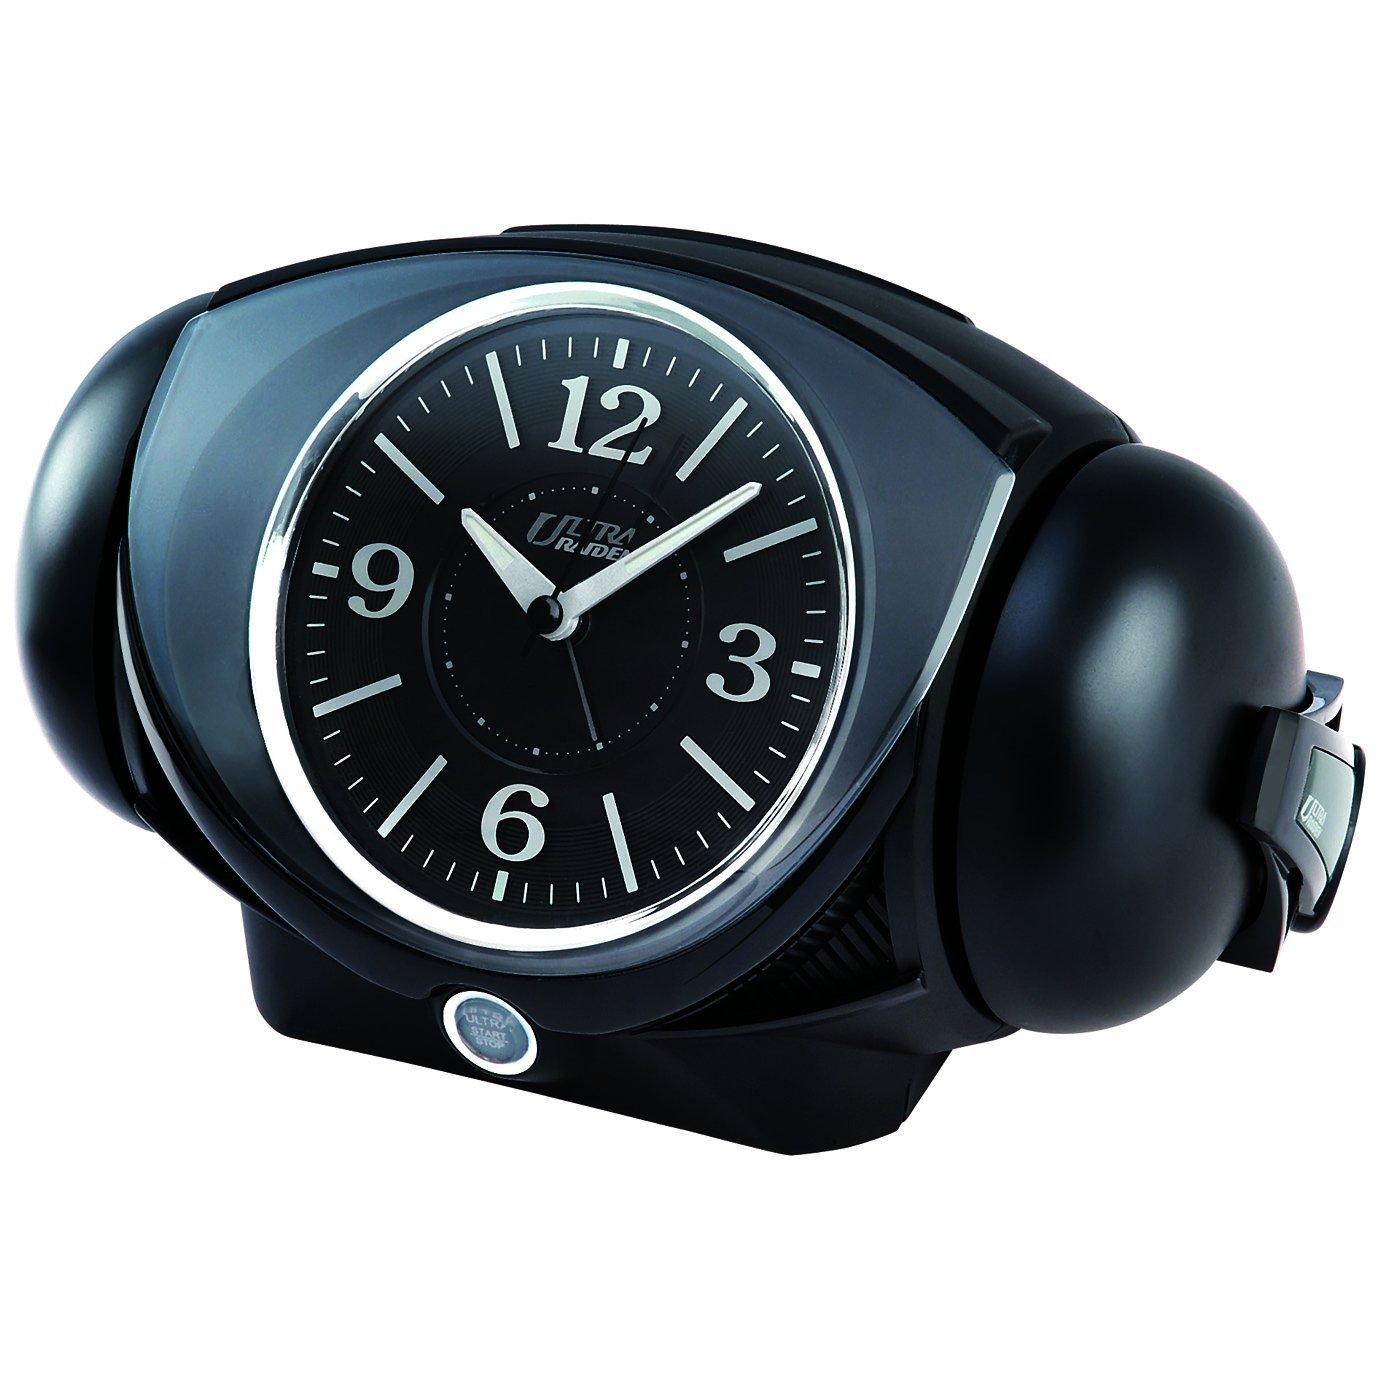 【SEIKO】大音量目覚まし時計 アナログ(ブラック)